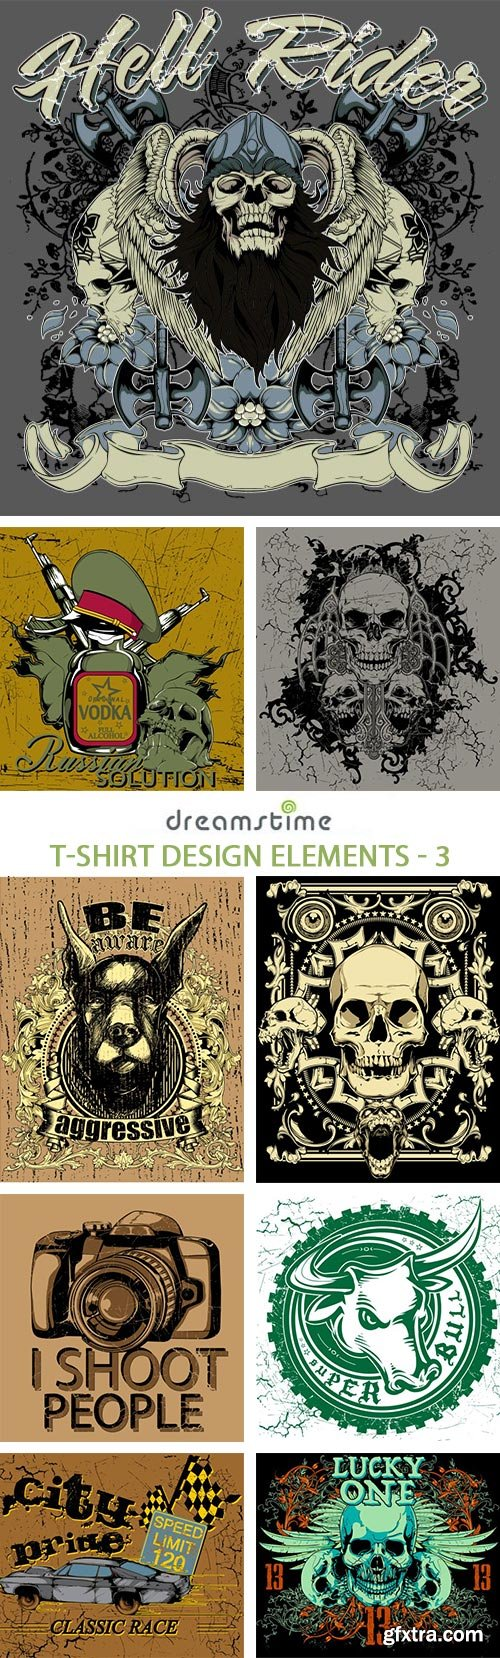 Shirt design elements - T Shirt Design Elements 3 25xeps